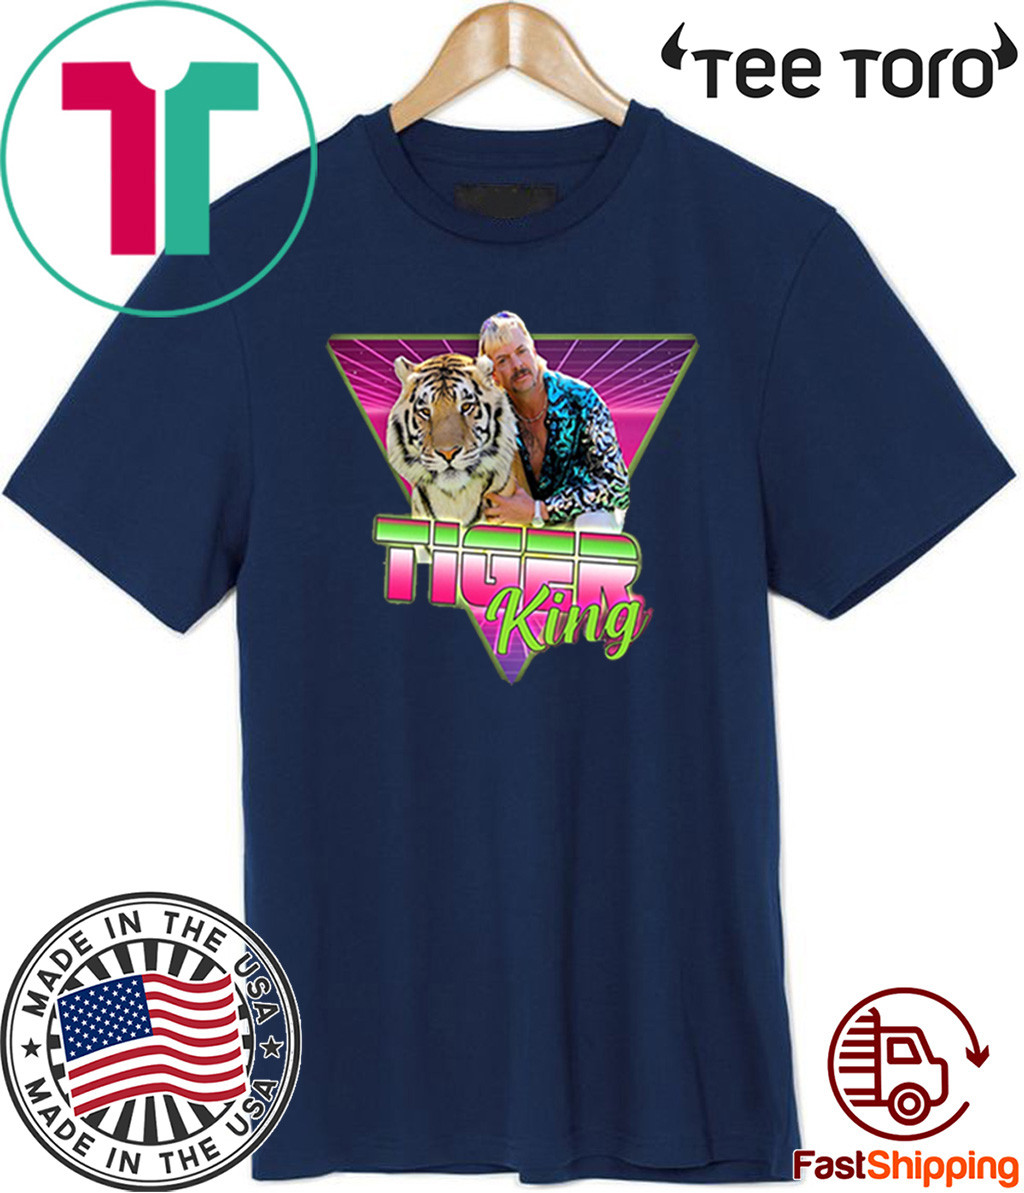 Joe Exotic – Joe Exotic 2020 Tiger King Shirt – #JoeExotic Shirt – Joe Exotic Retro Vintage Shirt T-Shirt